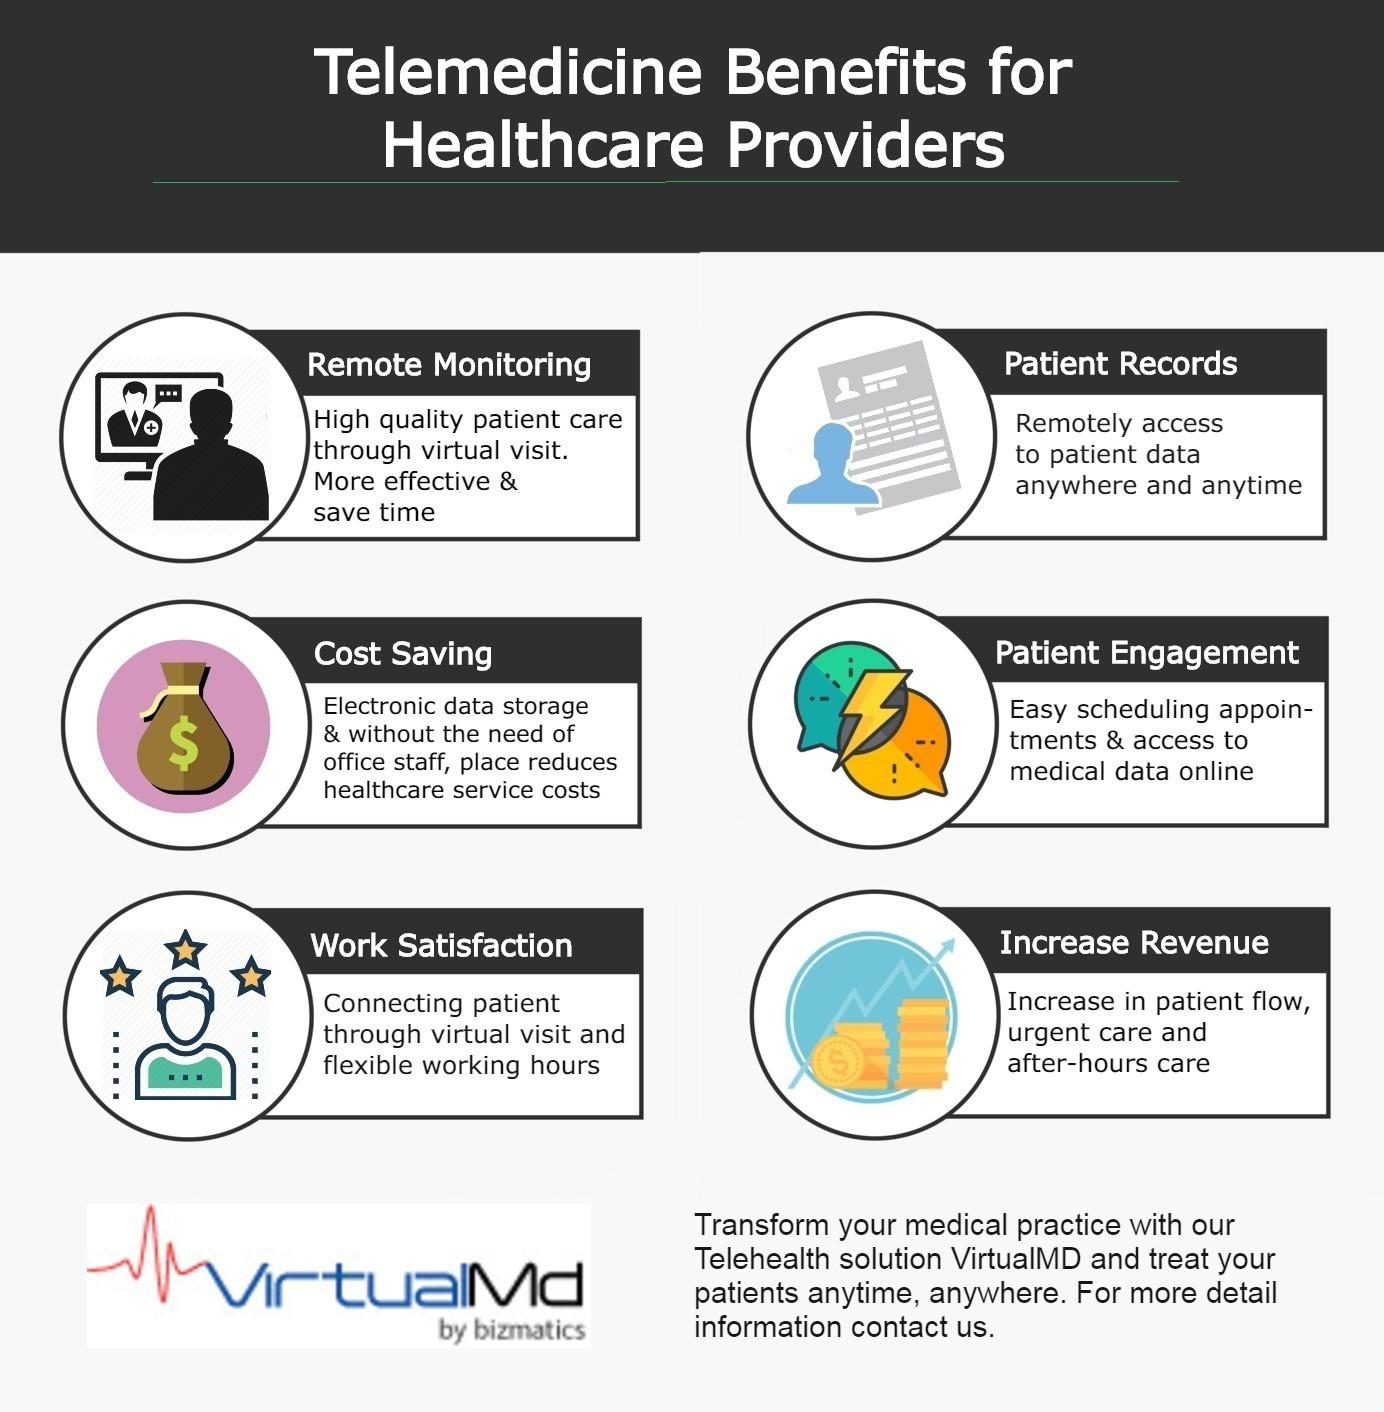 Benefits of telelemedicine app - Virtualmd